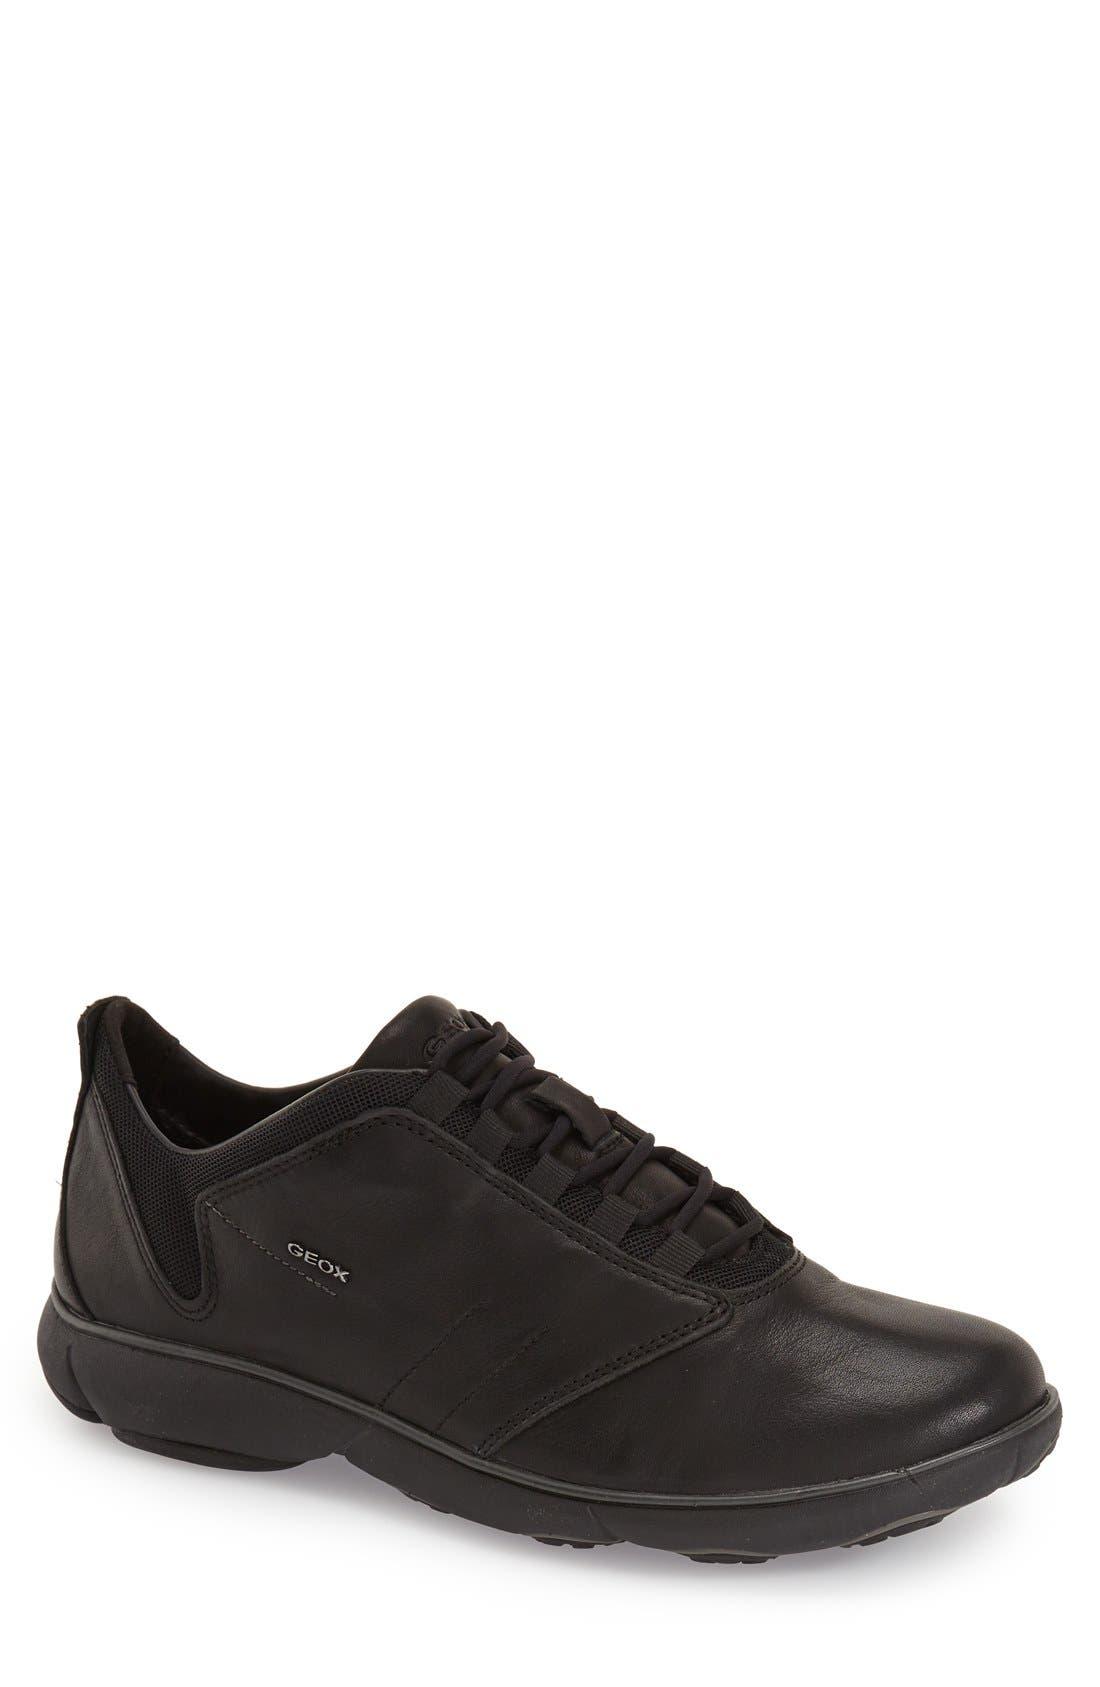 GEOX Nebula 11 Sneaker